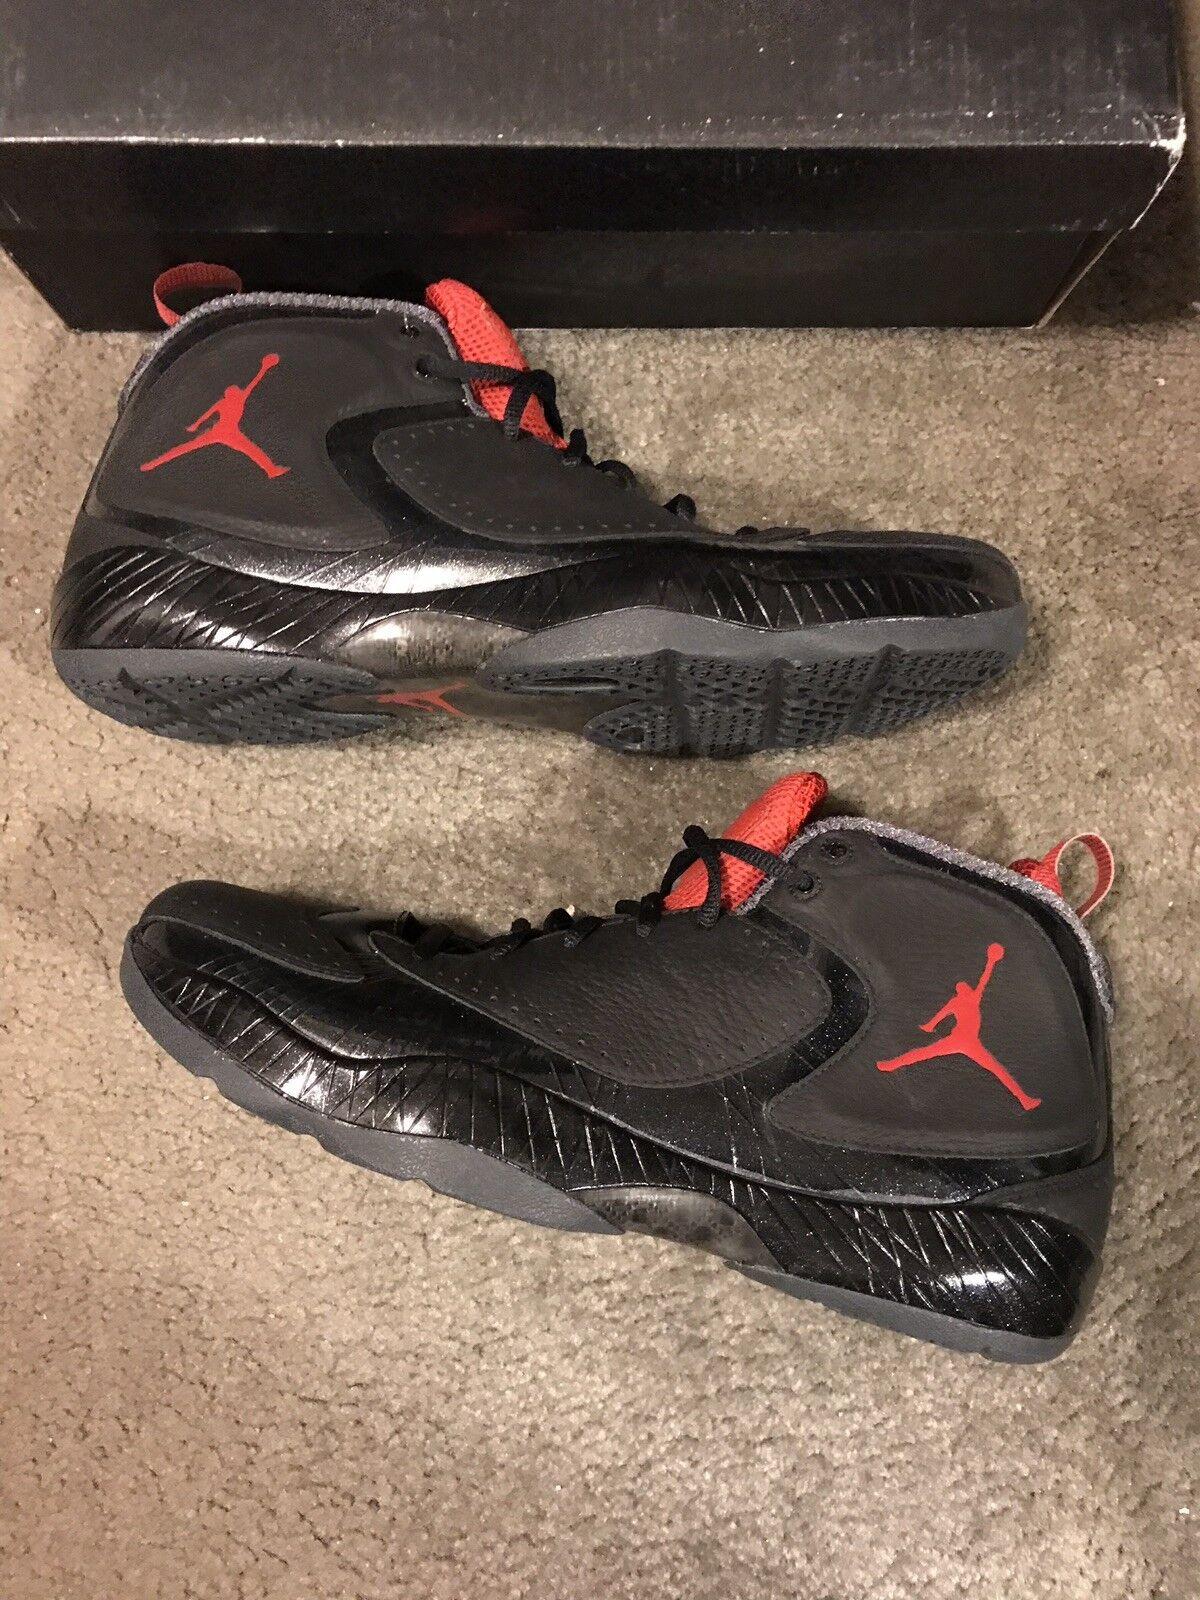 Air Jordan 2012 Size 13